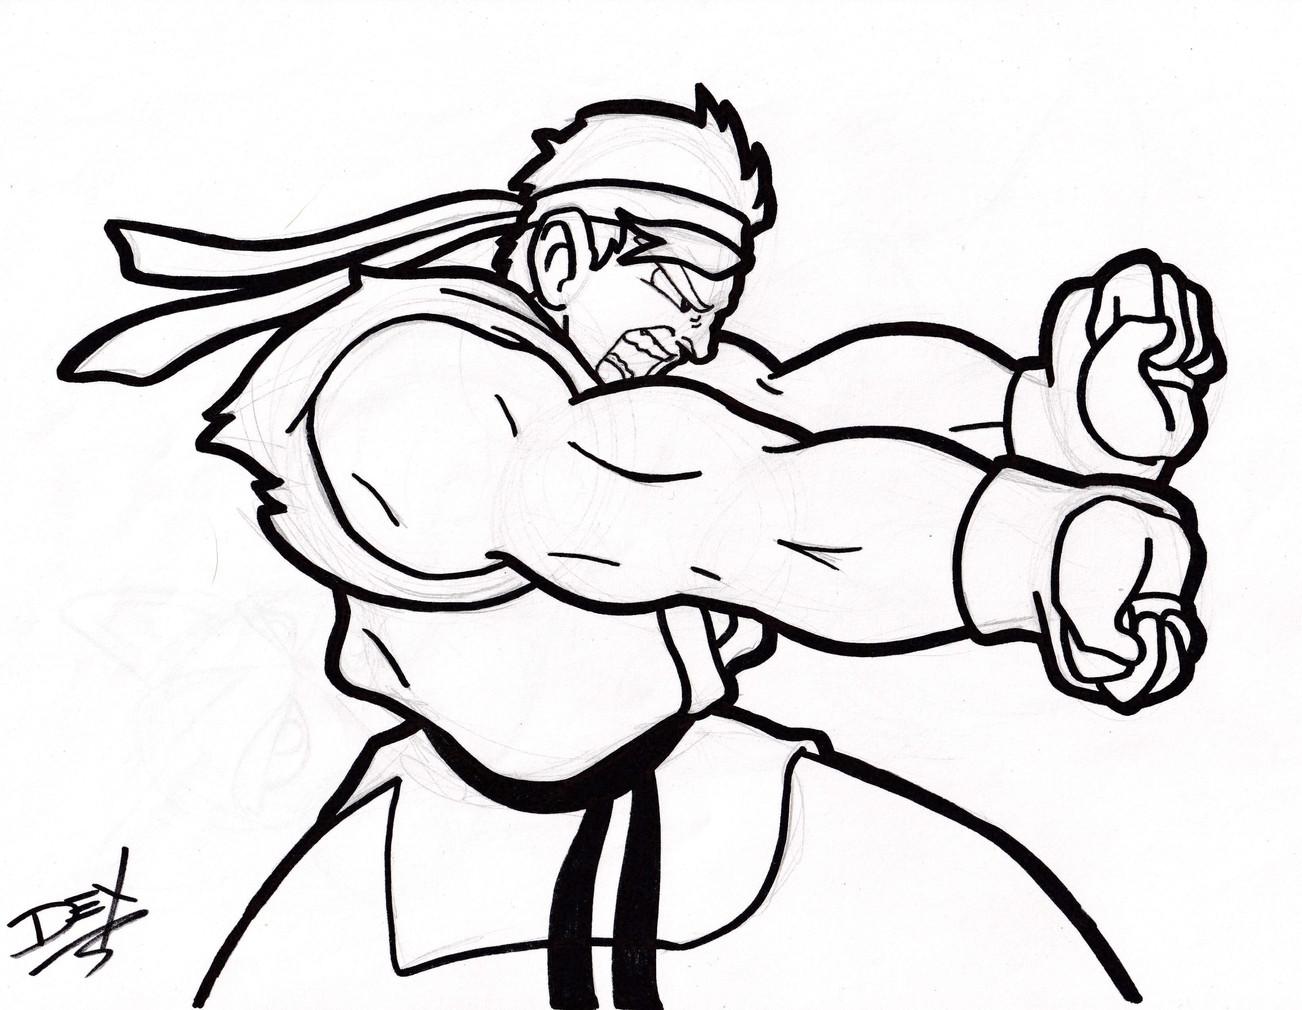 "Ryu (8.5"" x 11"", Graphite & Ink)"